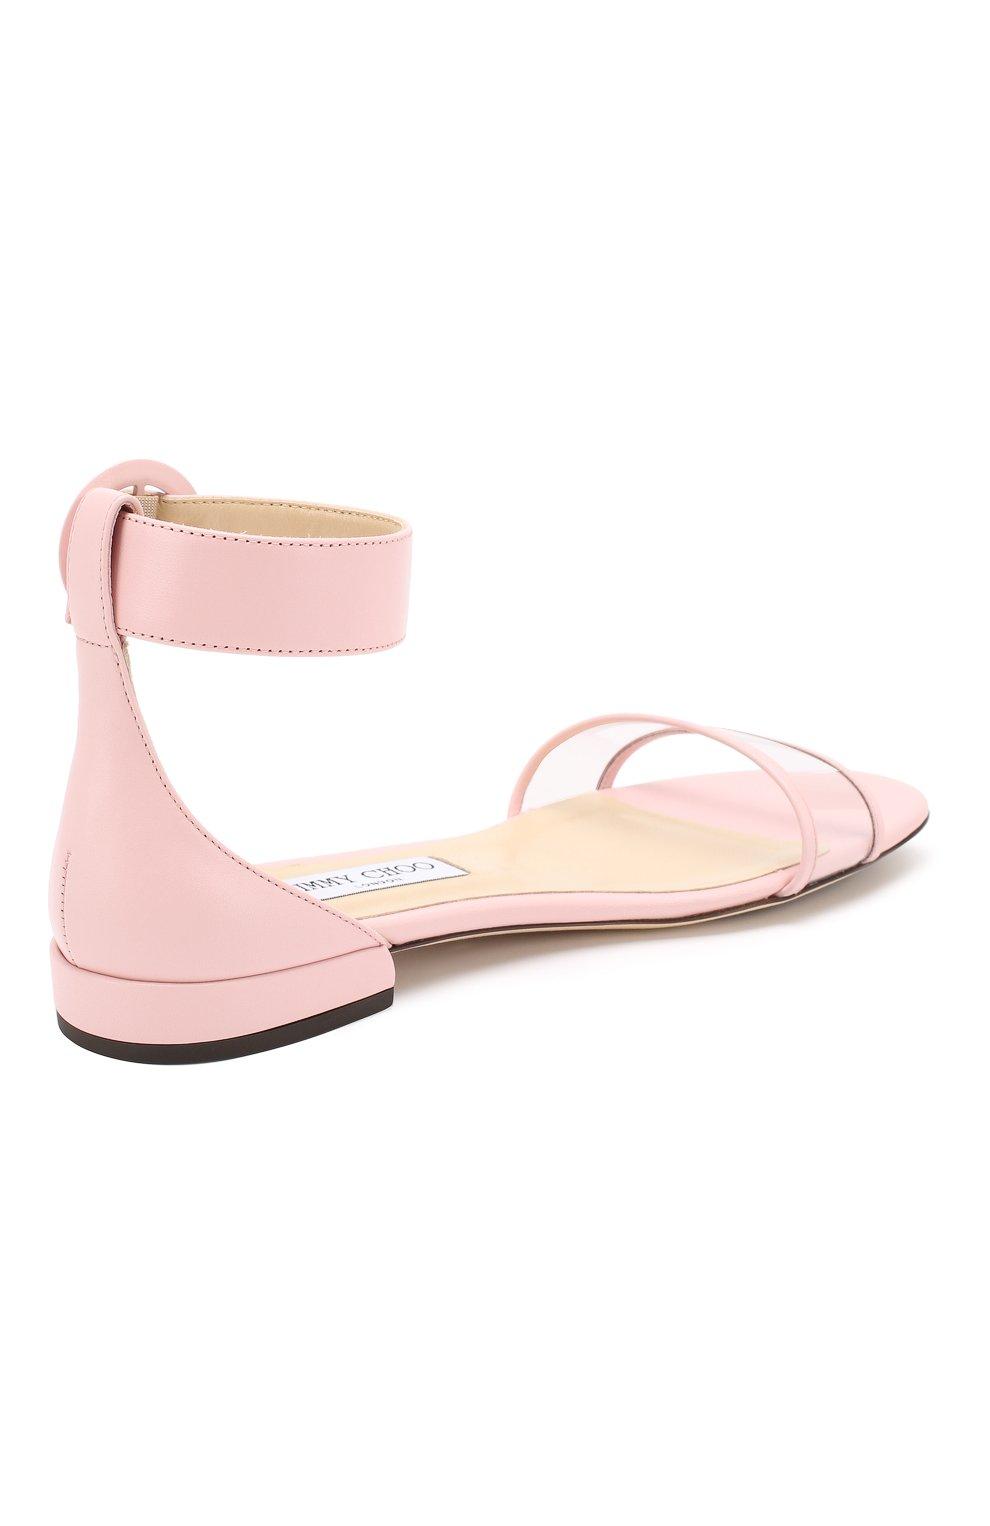 Кожаные сандалии Jamie  Jimmy Choo светло-розовые | Фото №4